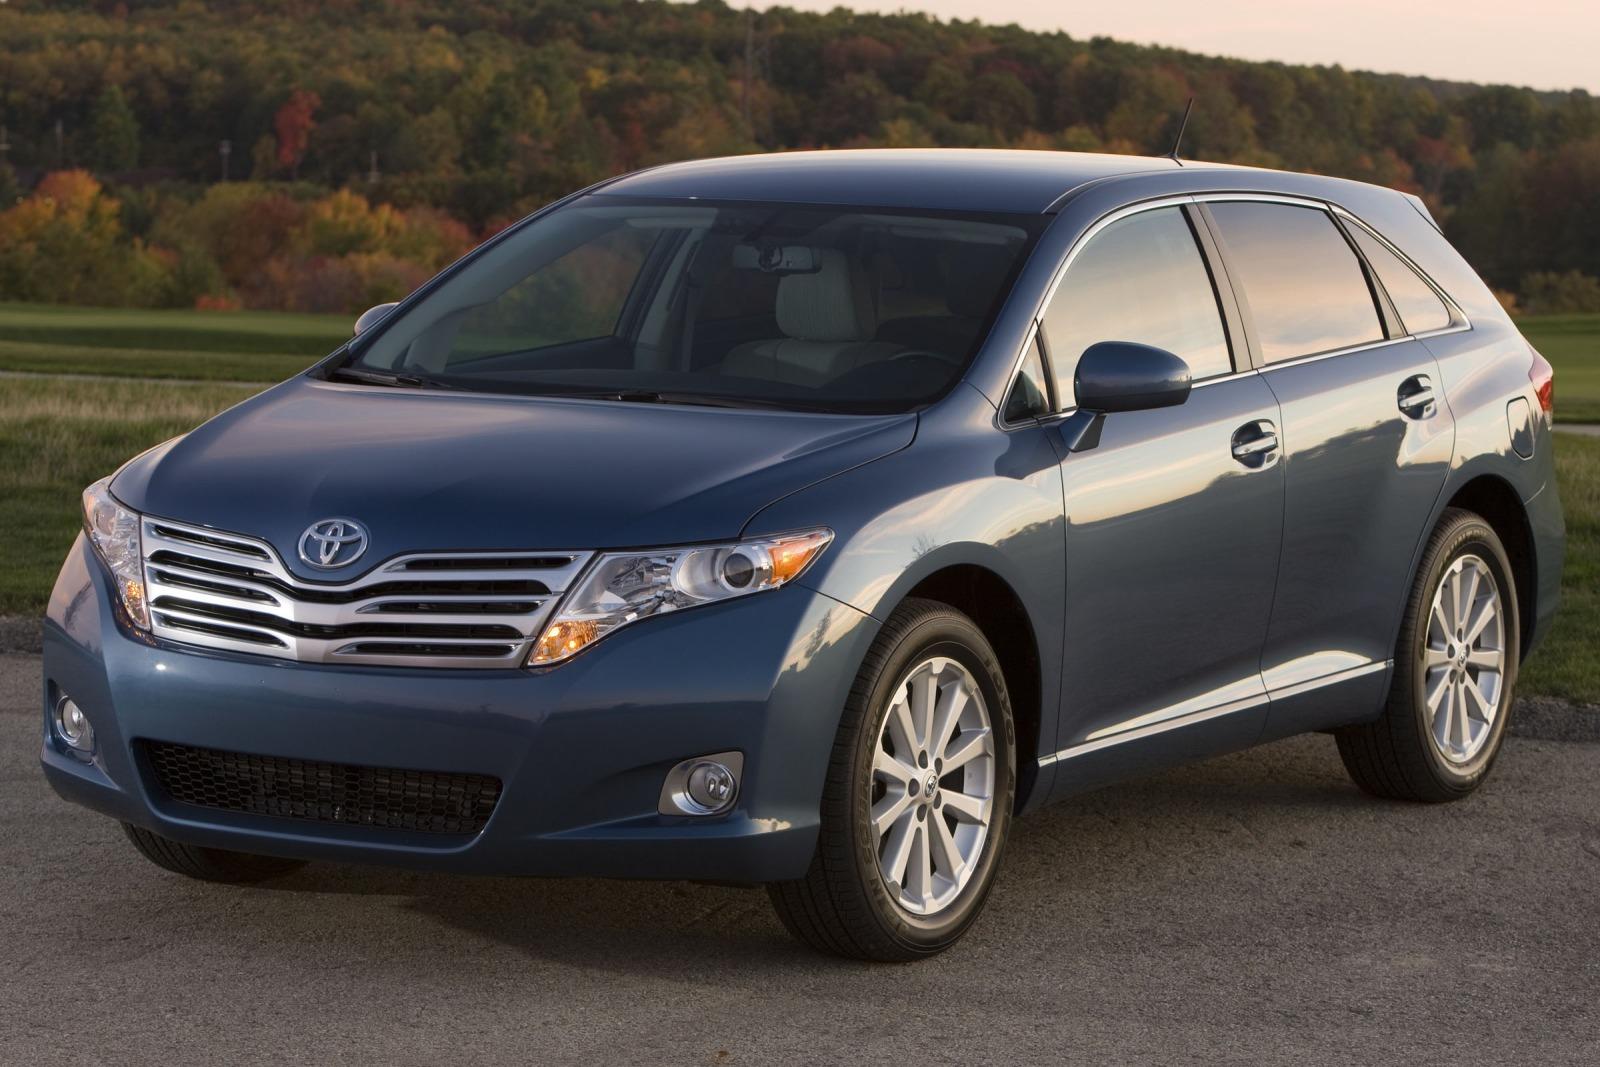 2012 toyota venza wagon xle fq oem 2 1600